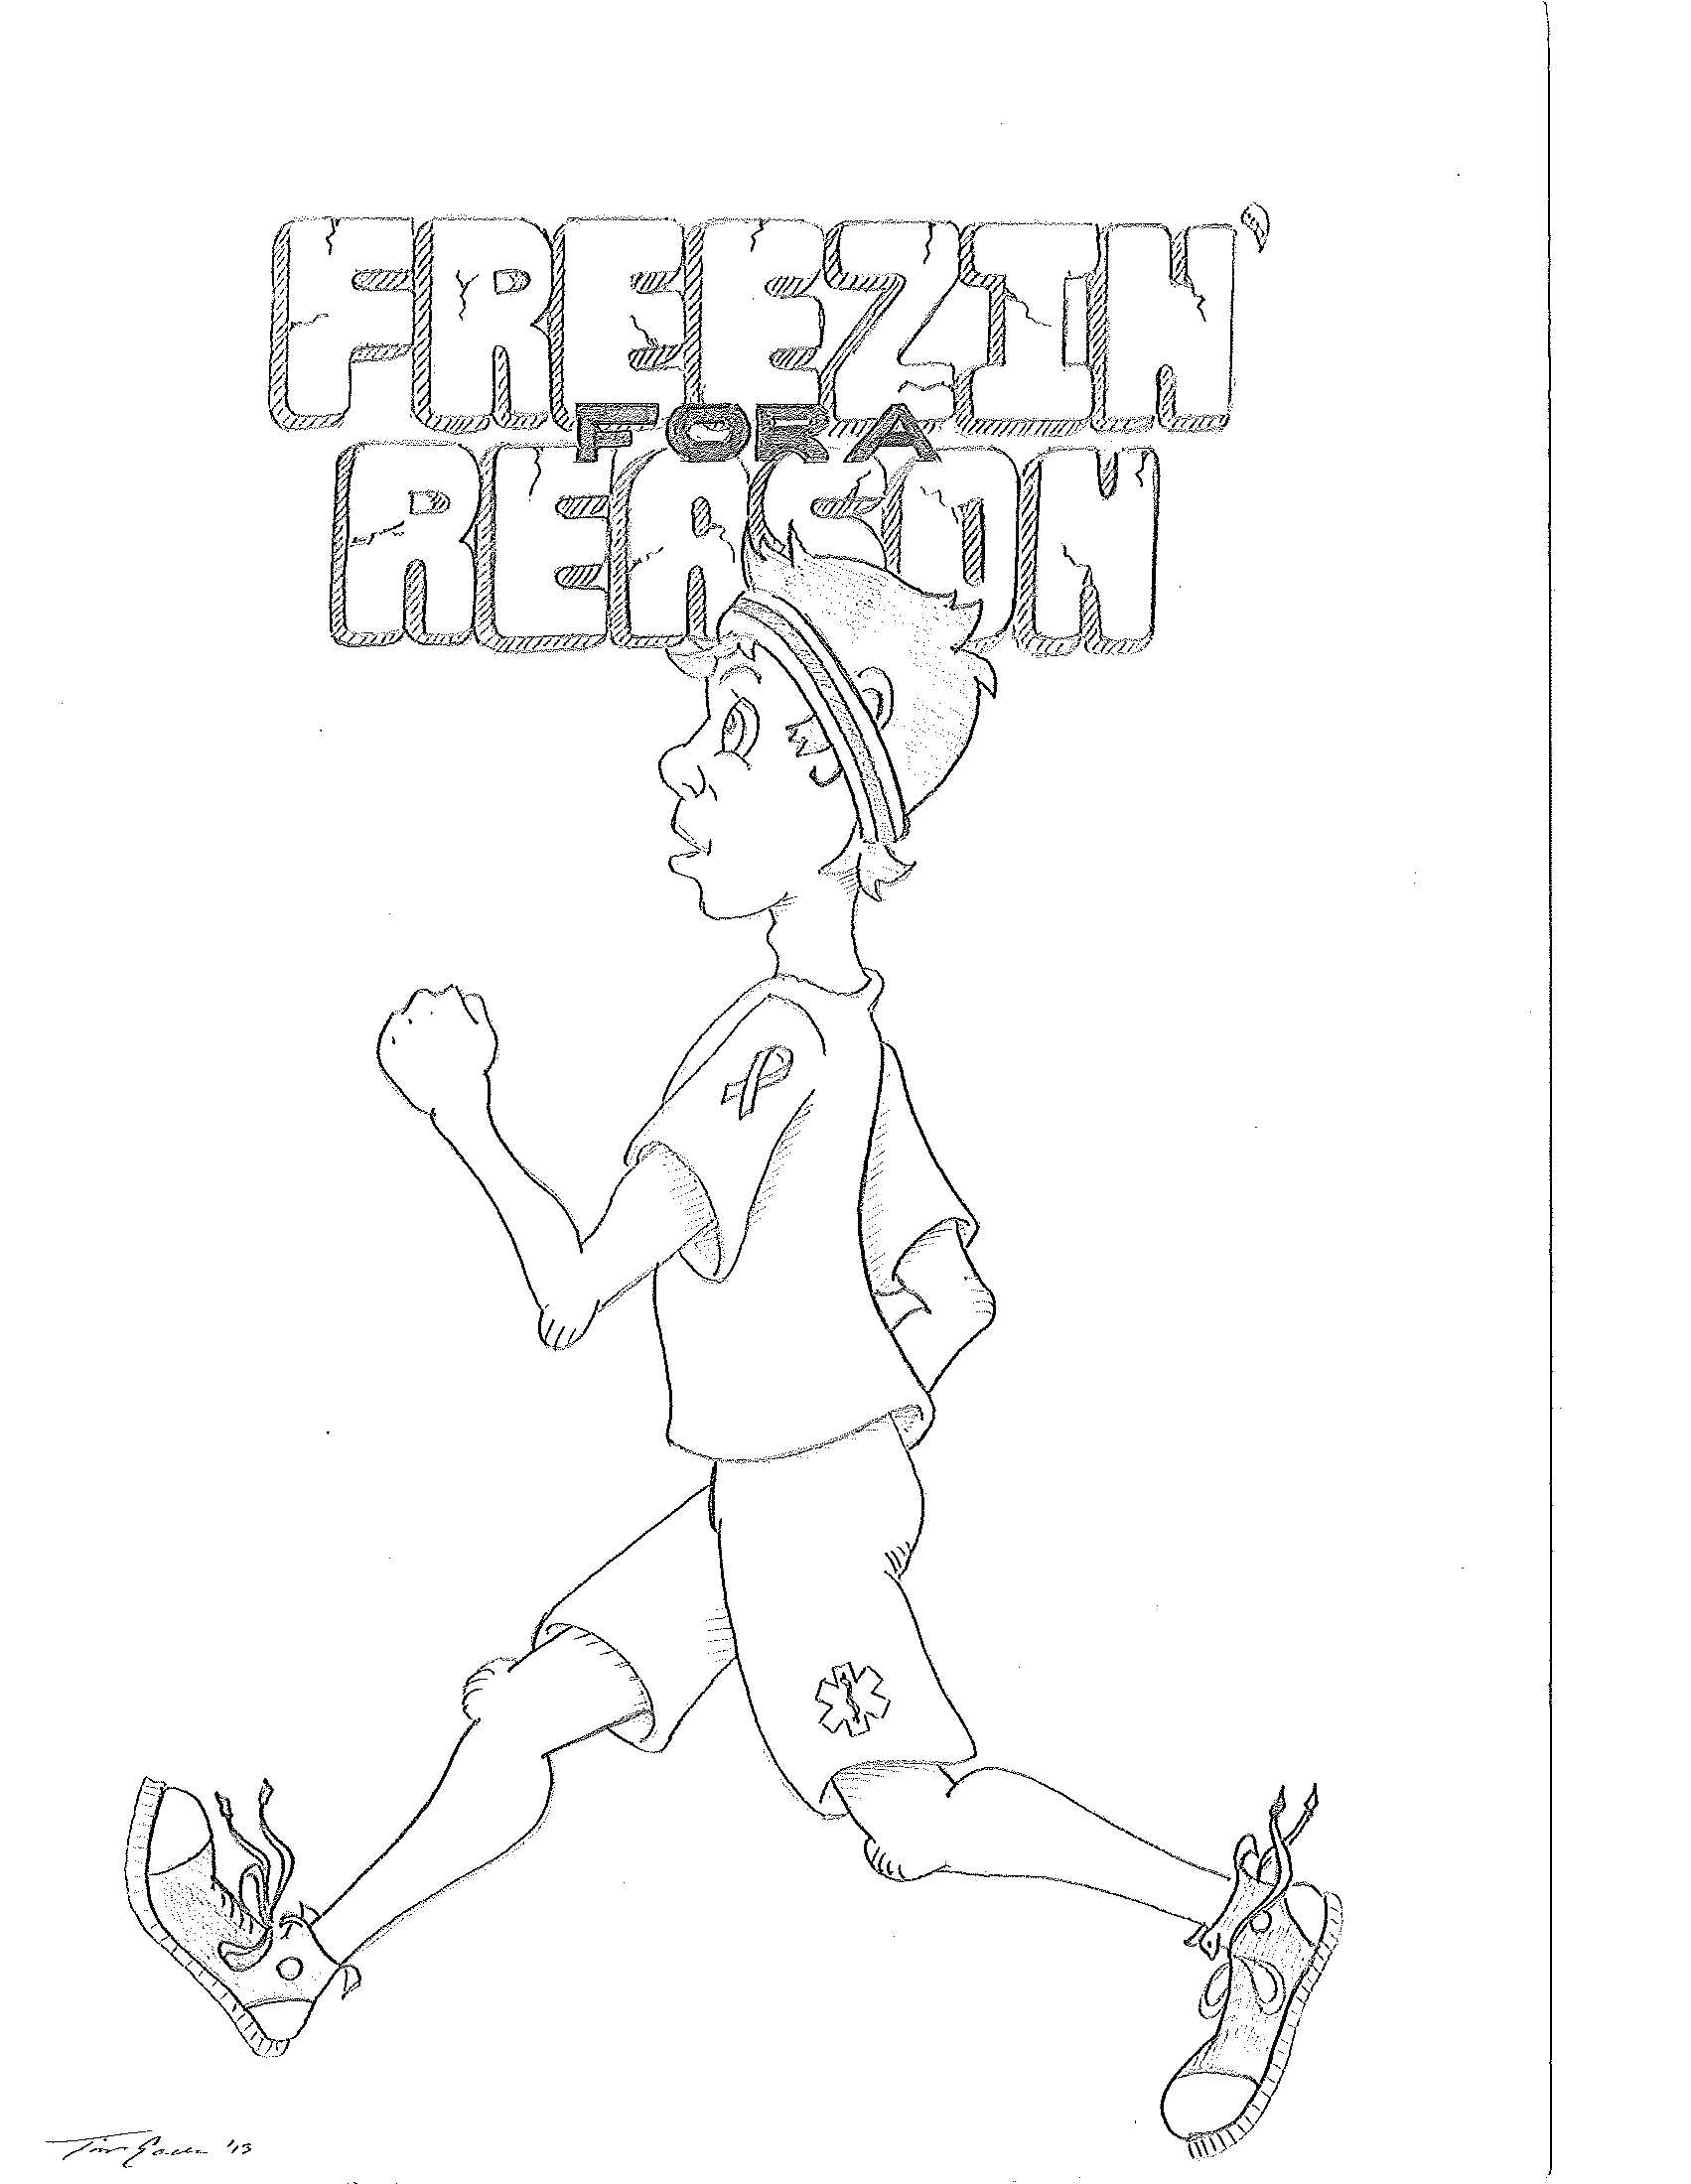 Freezin'4aReason